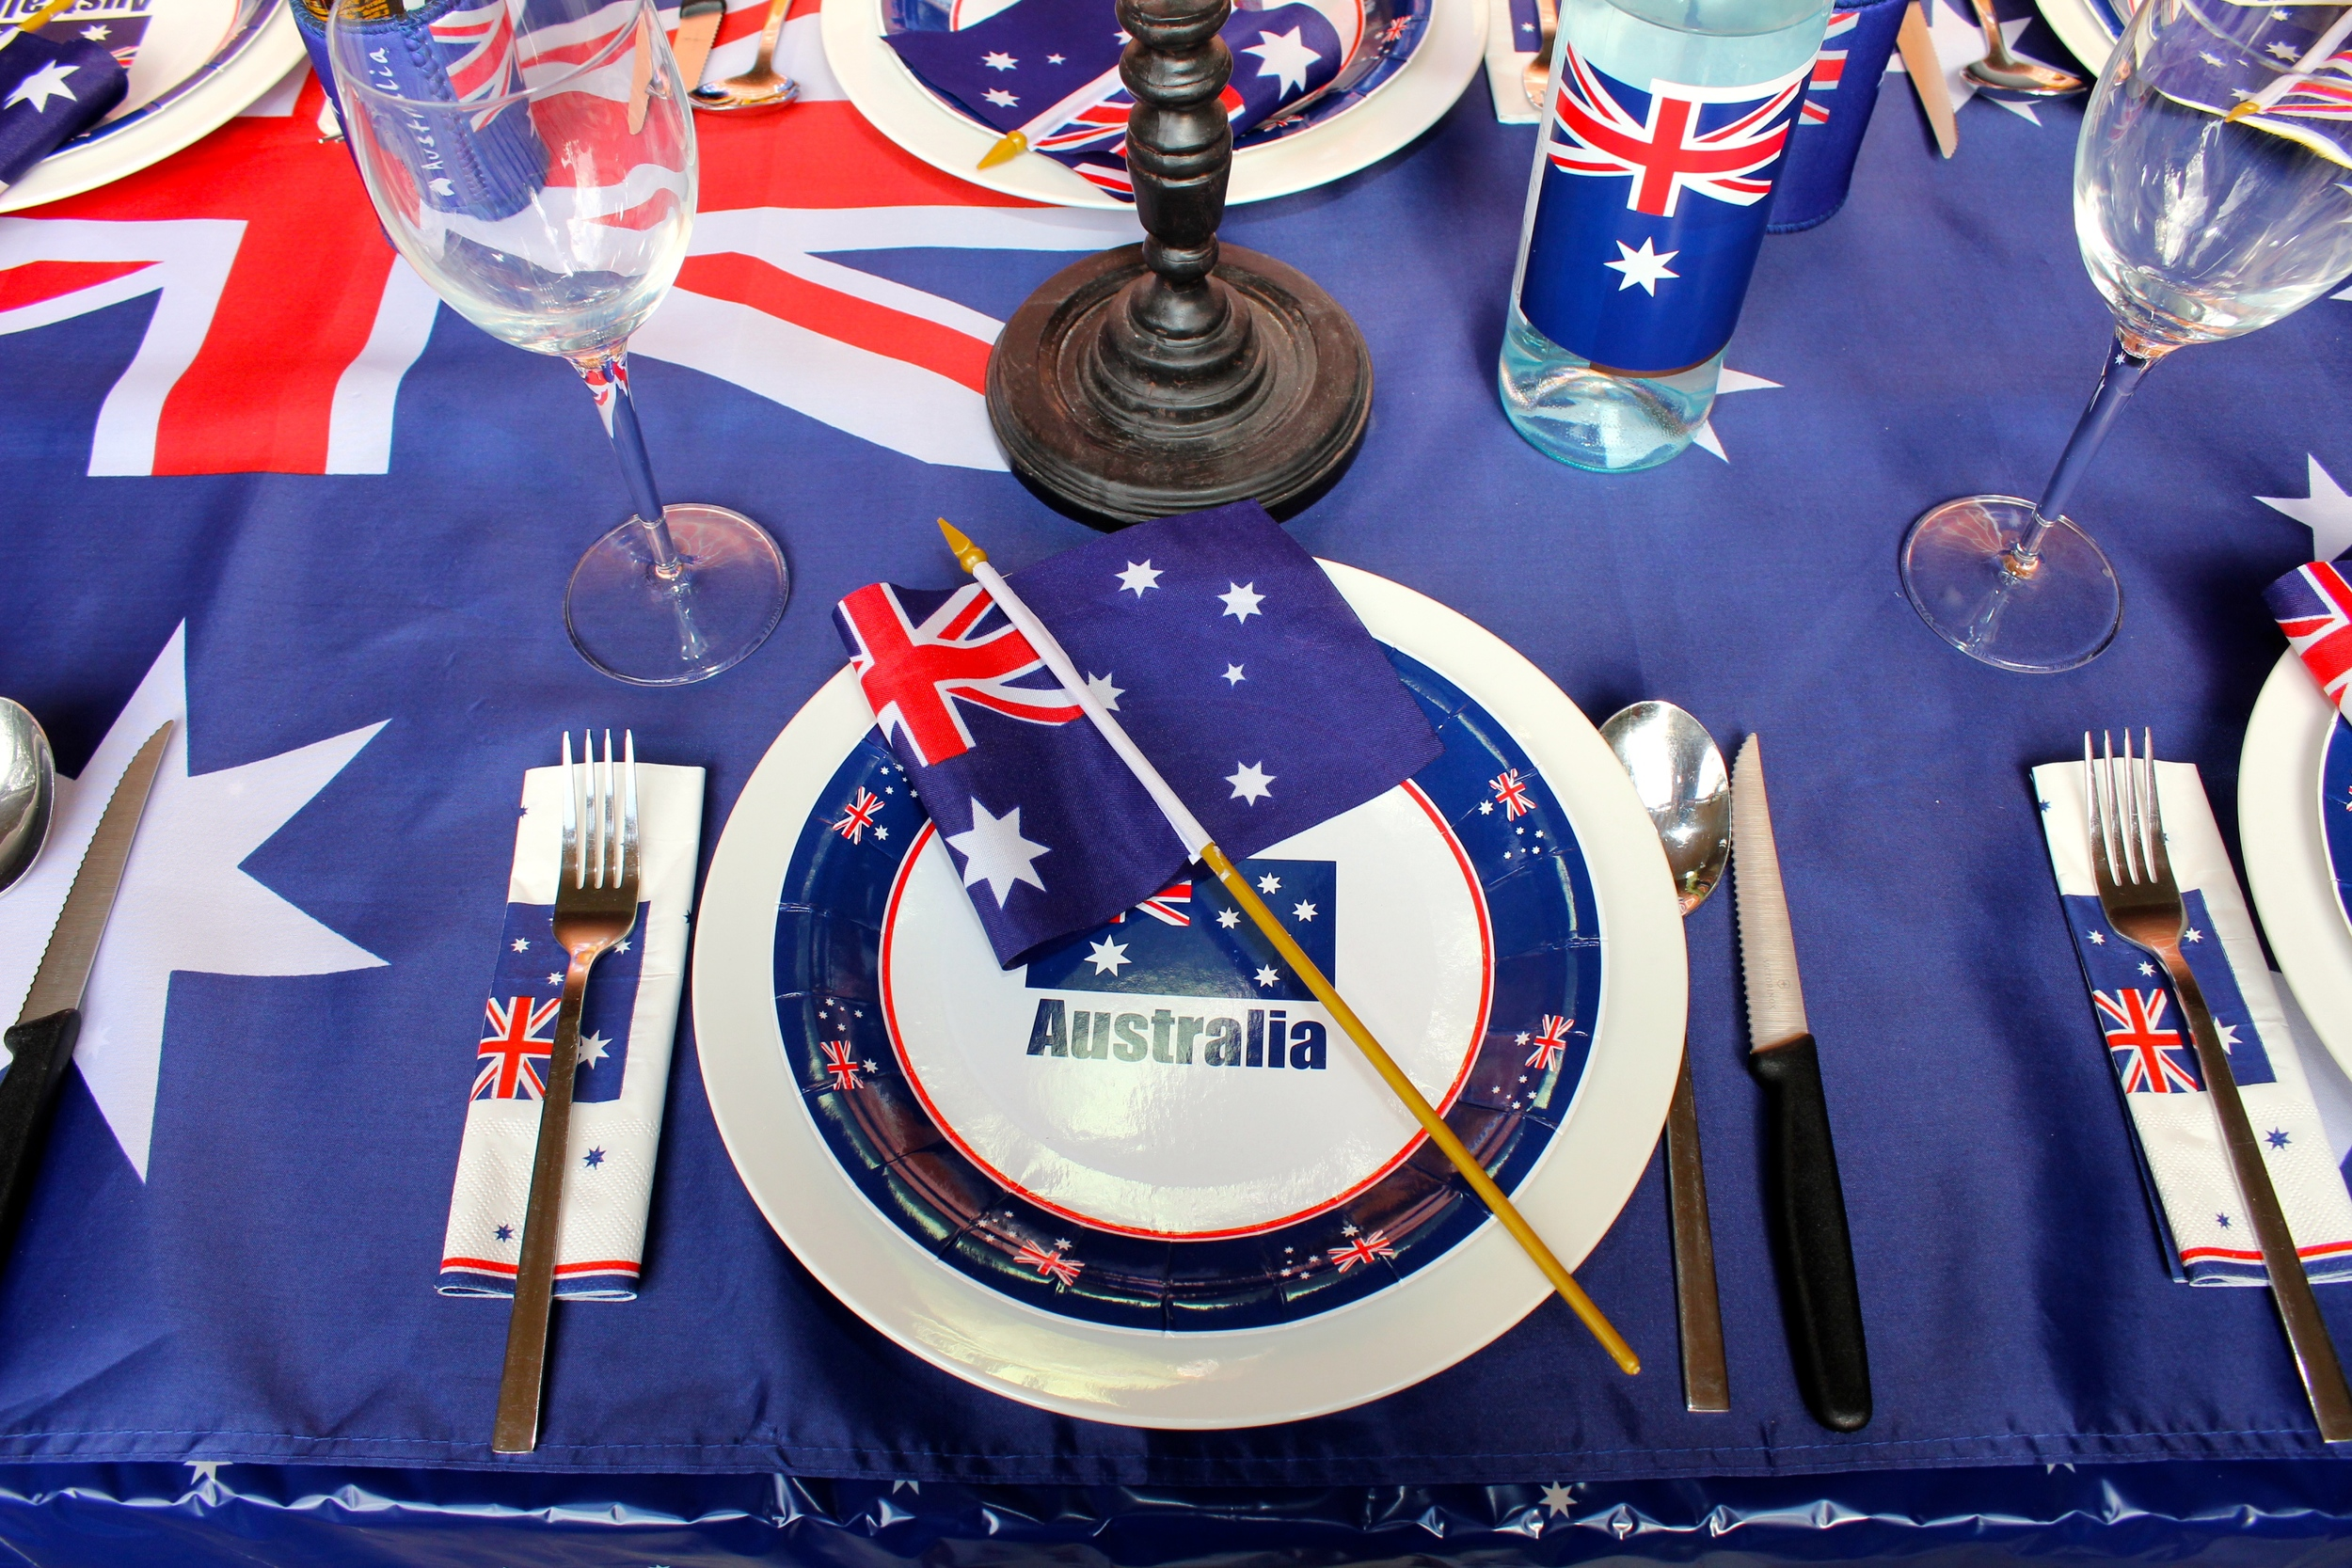 Australia Day Place Settings